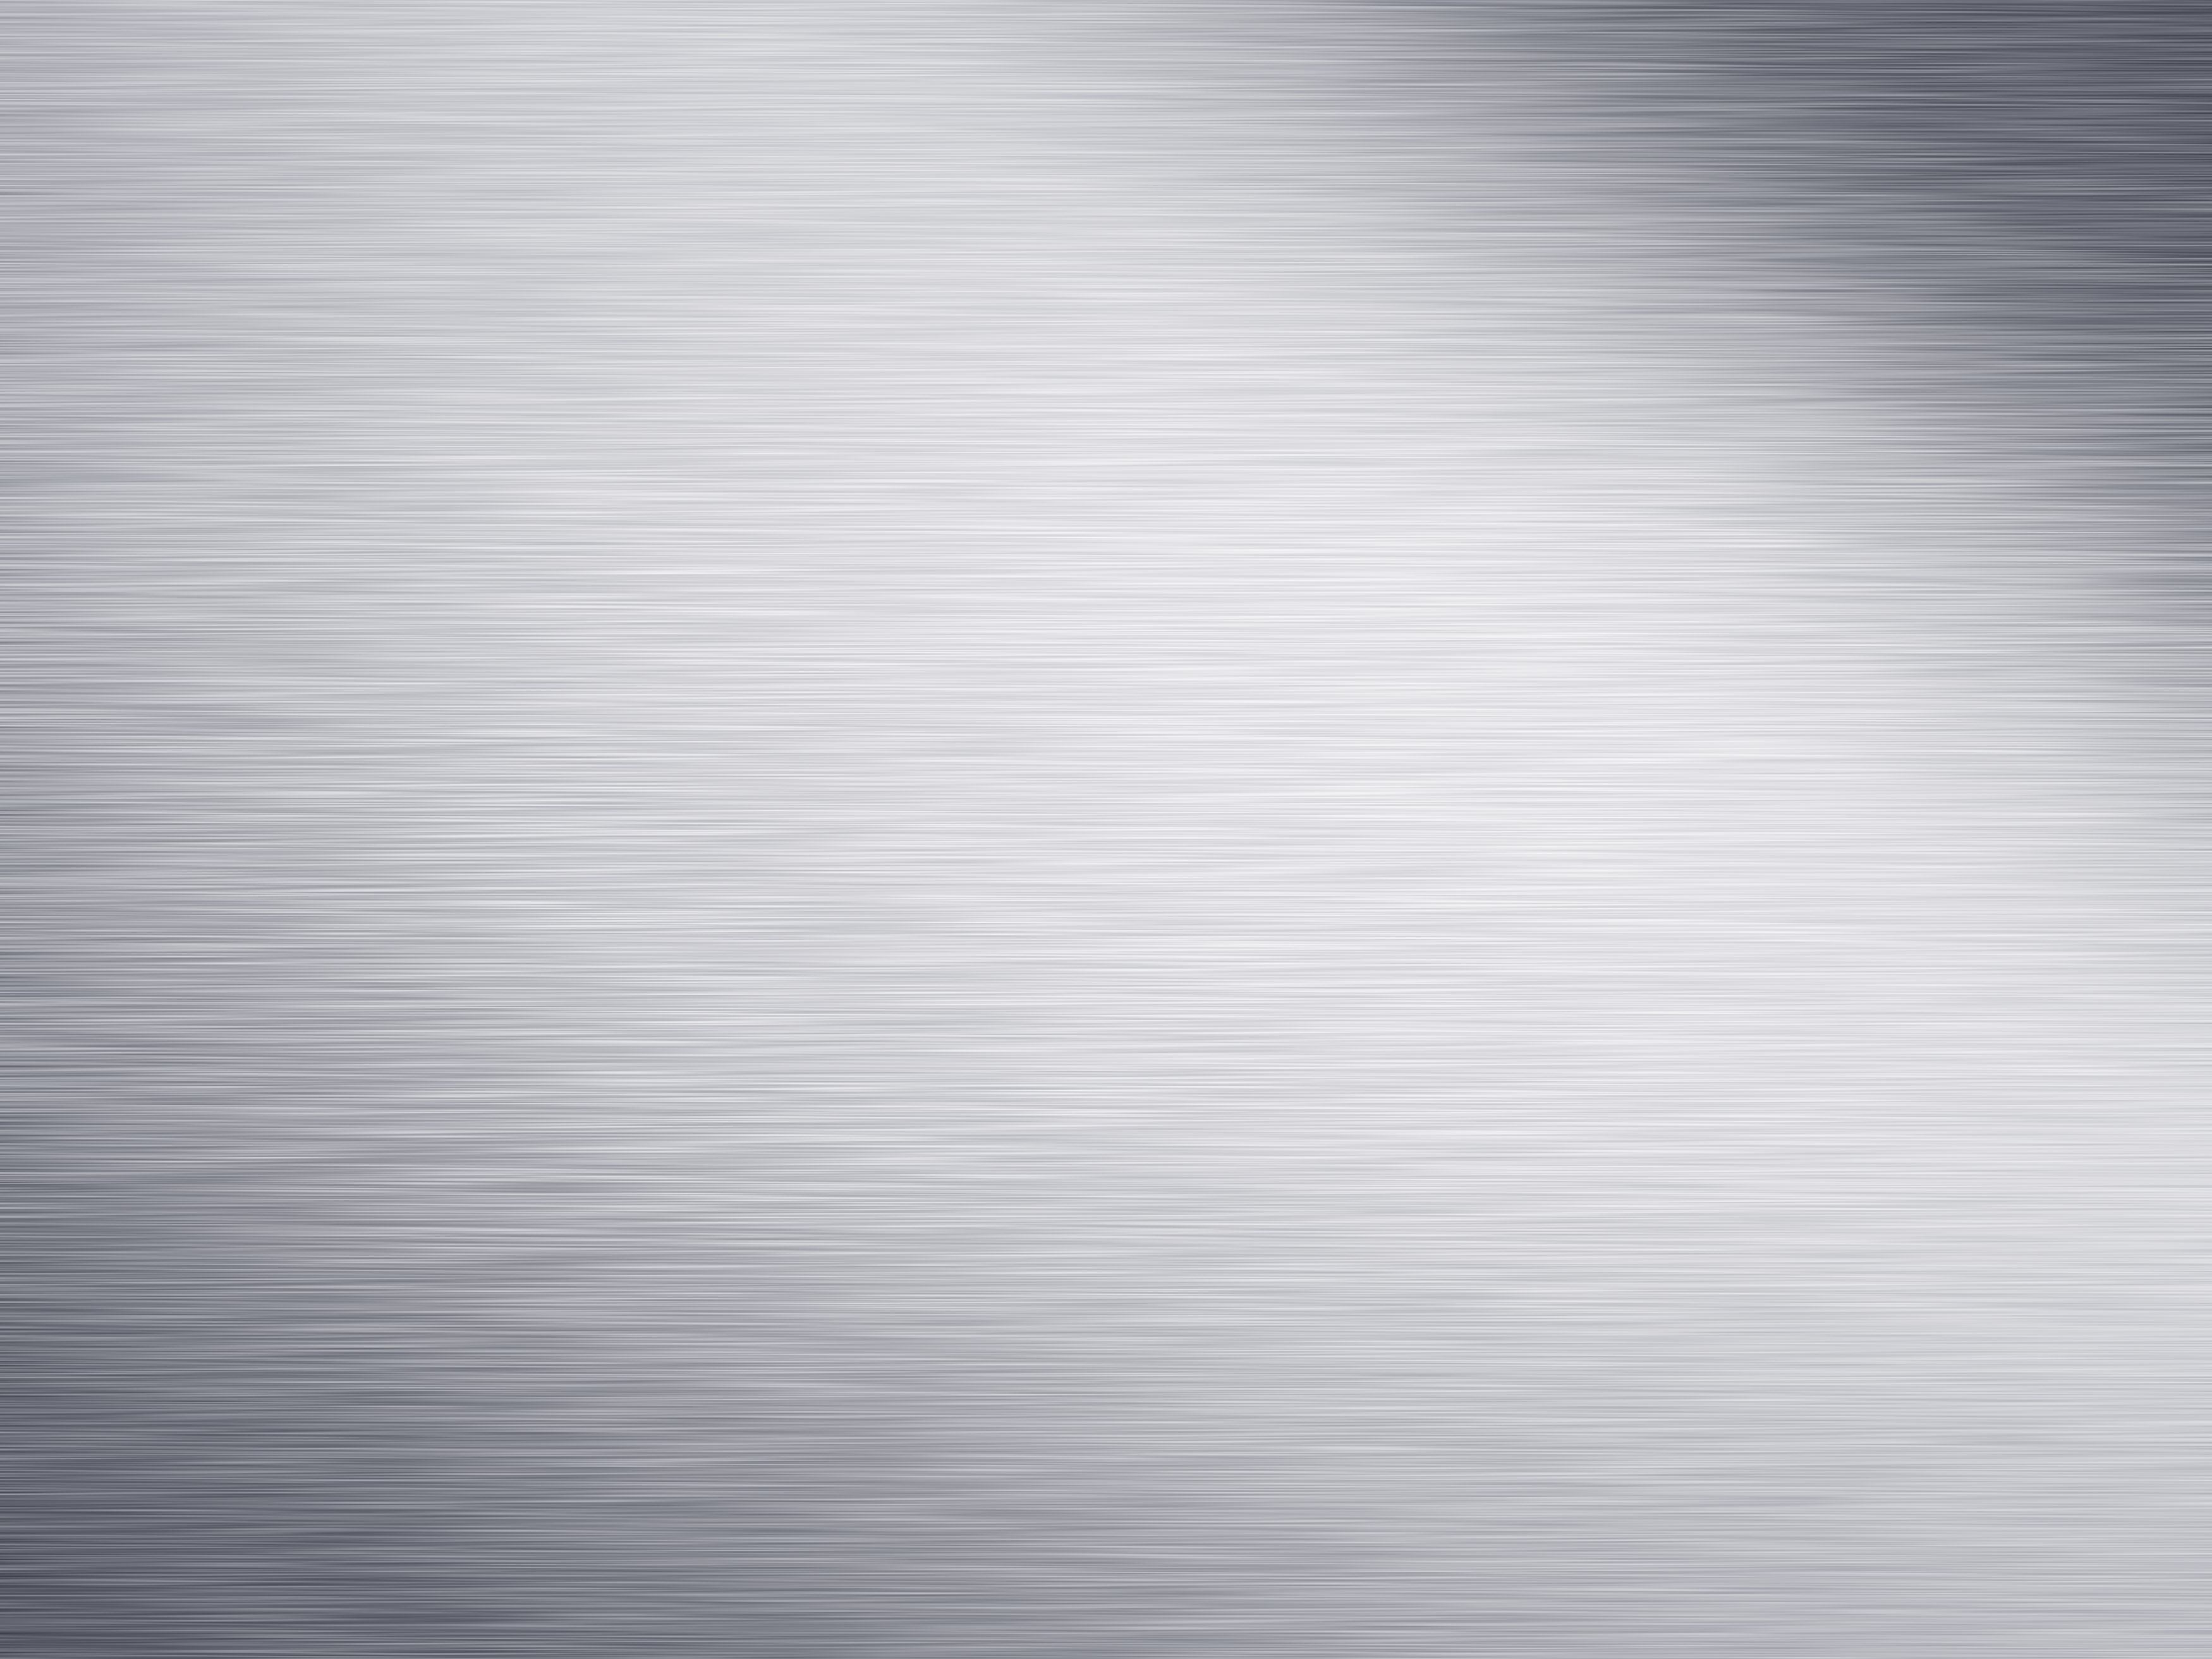 aluminum texture background download aluminum texture background 3500x2625